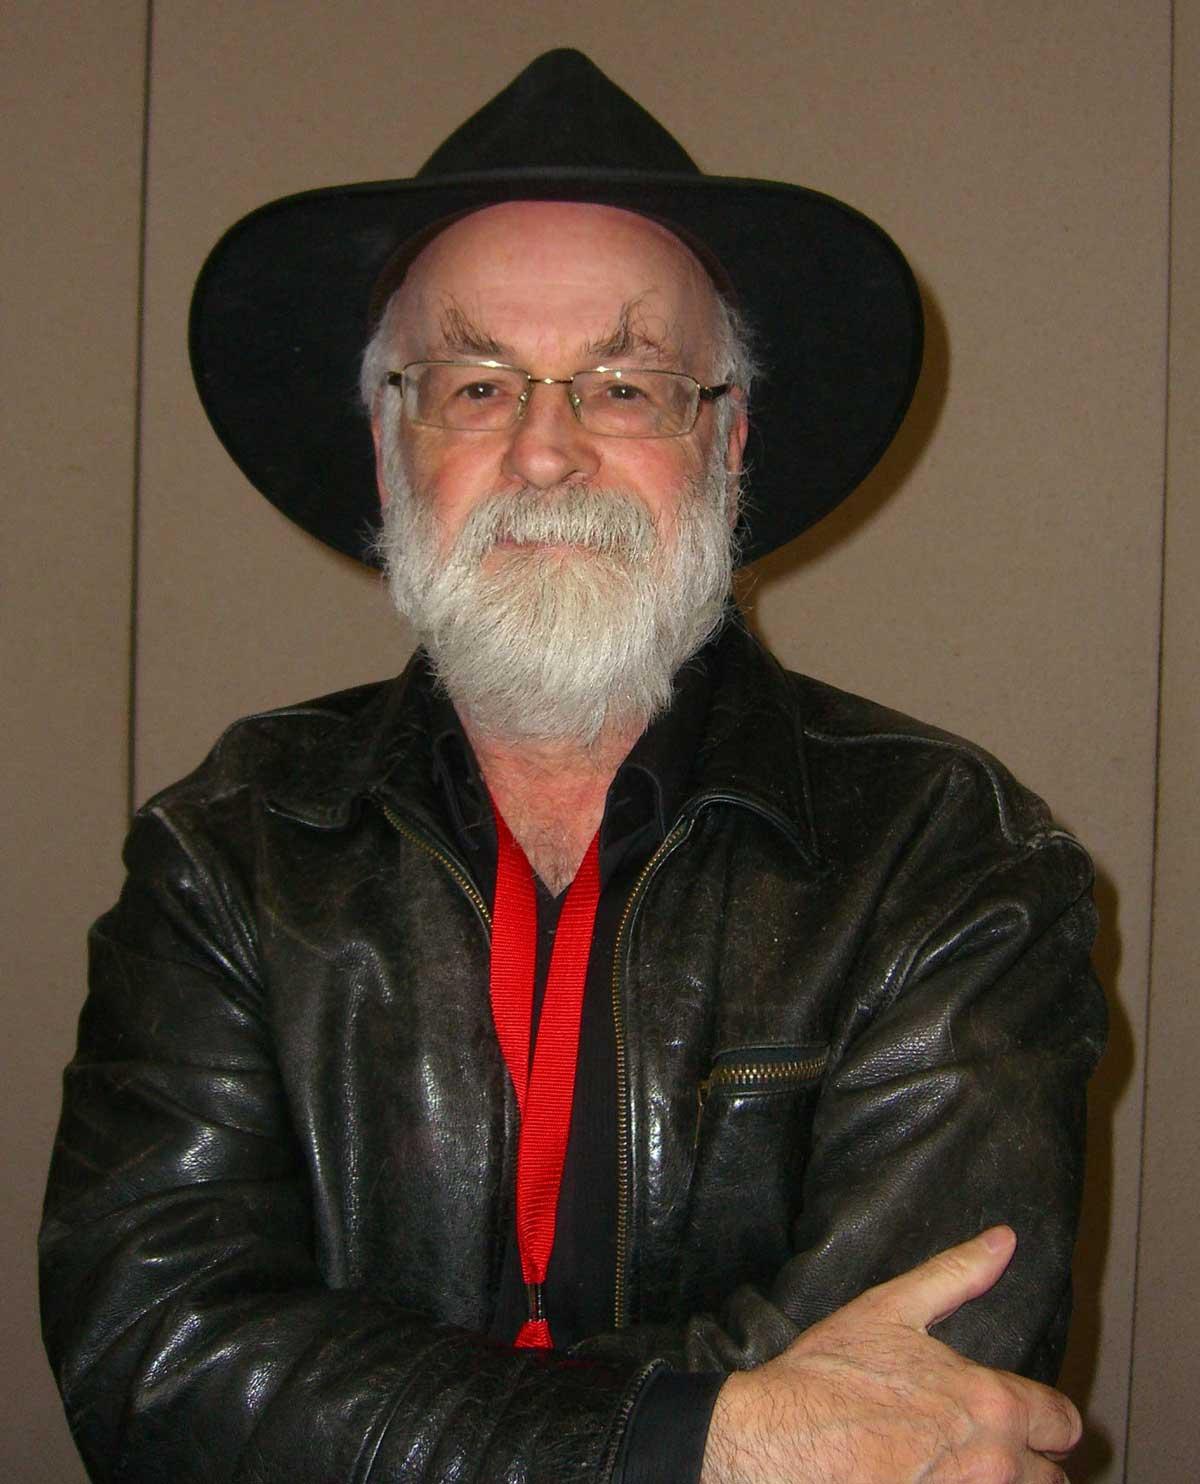 Novelist Terry Pratchett on Day 2 of the 2012 New York Comic Con, Friday October 12, 2012 at the Jacob K. Javits Convention Center in Manhattan Photo: Luigi Novi © Luigi Novi / Wikimedia Commons.